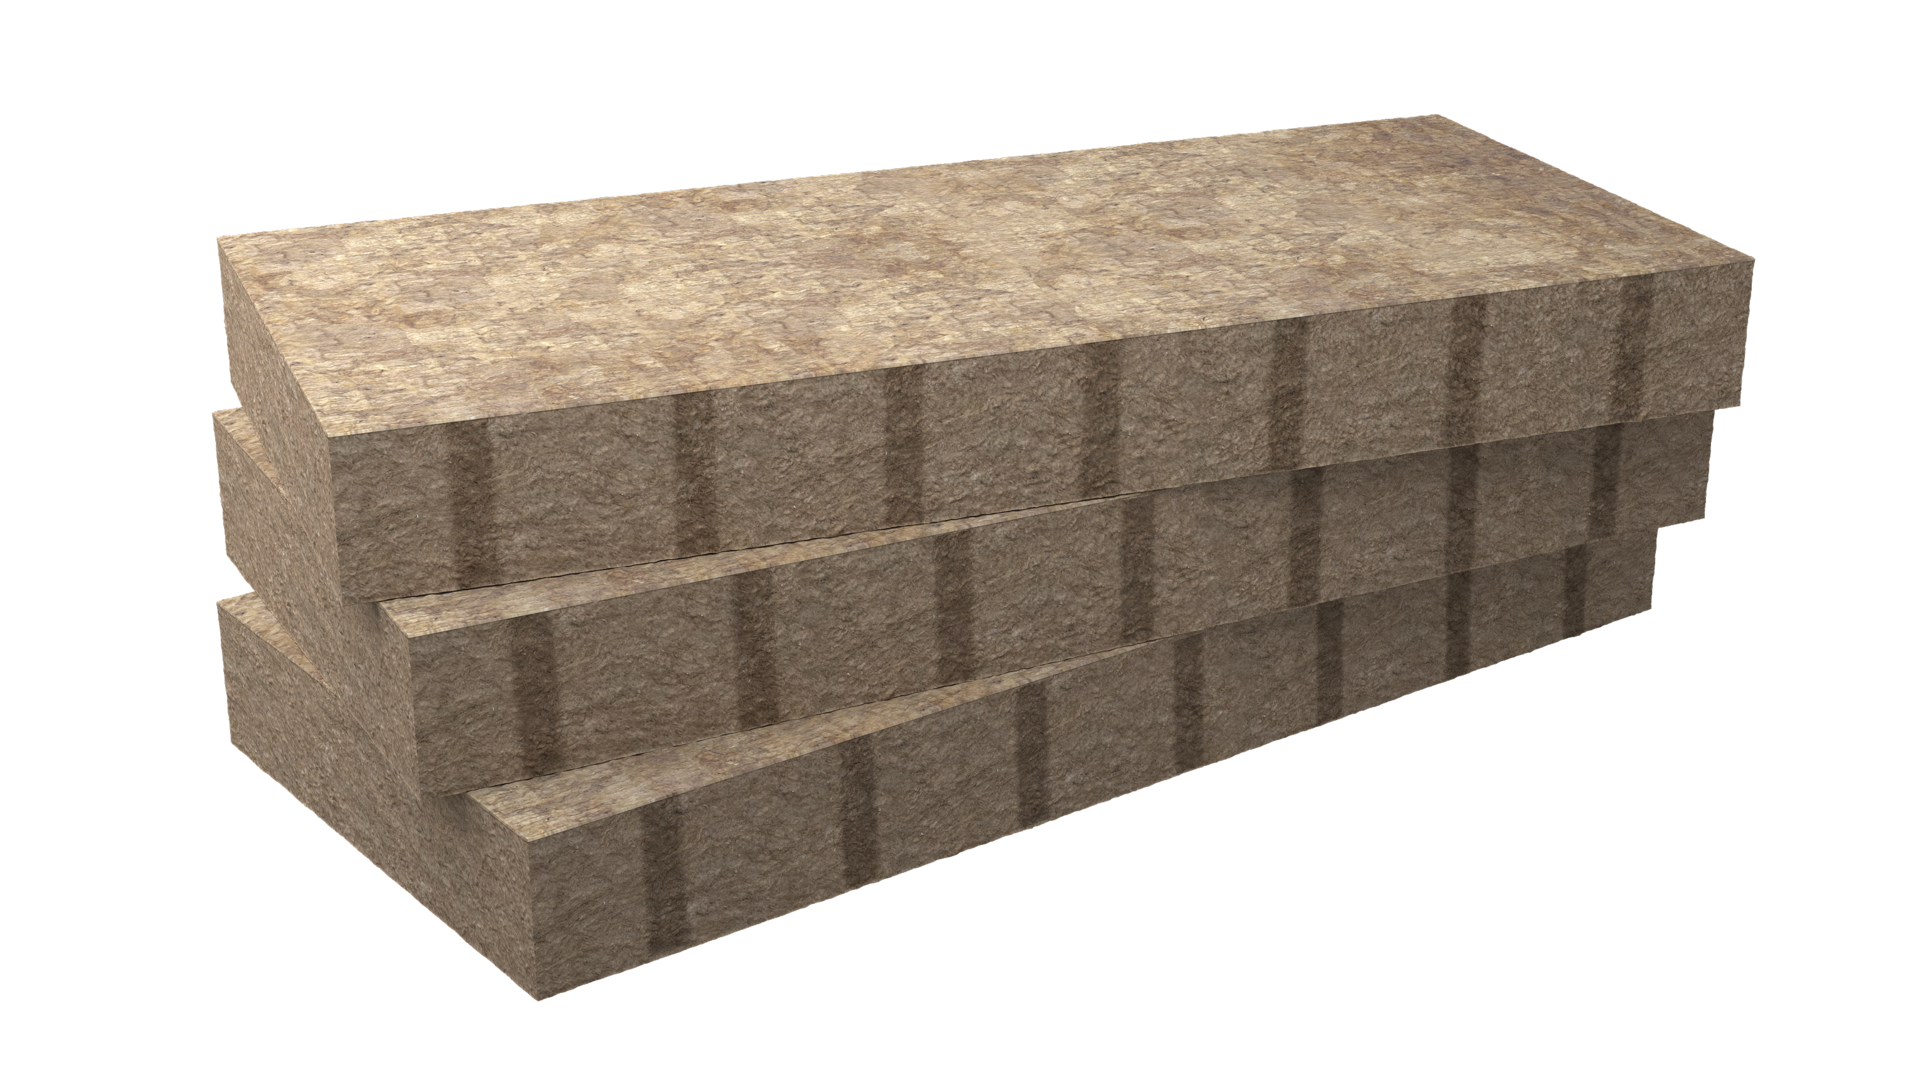 Mb Rock Premium 2020, murs intérieurs, ossature bois, internal walls